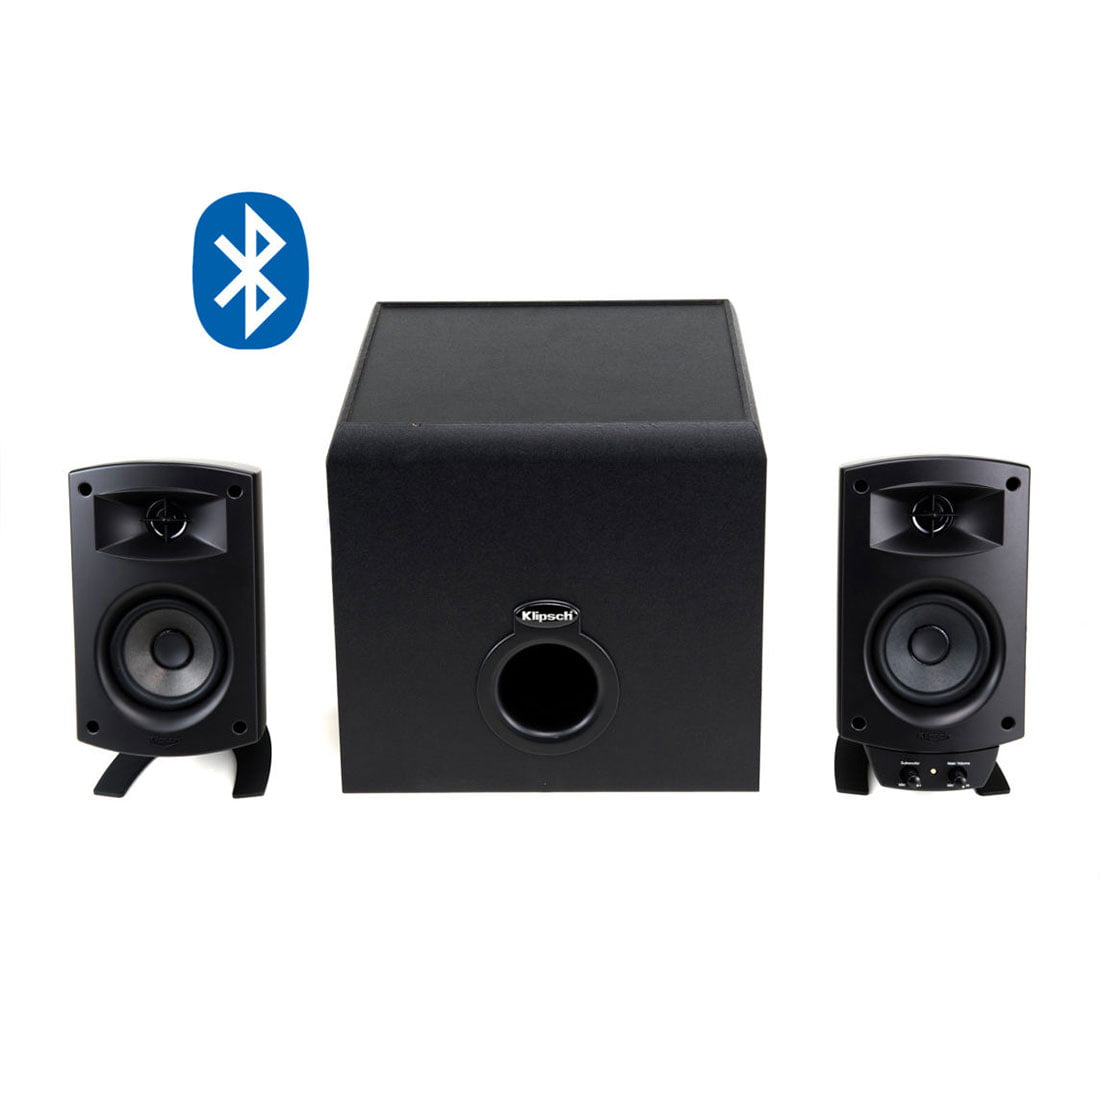 Klipsch Promedia 2 1 Bluetooth Speaker Bundle